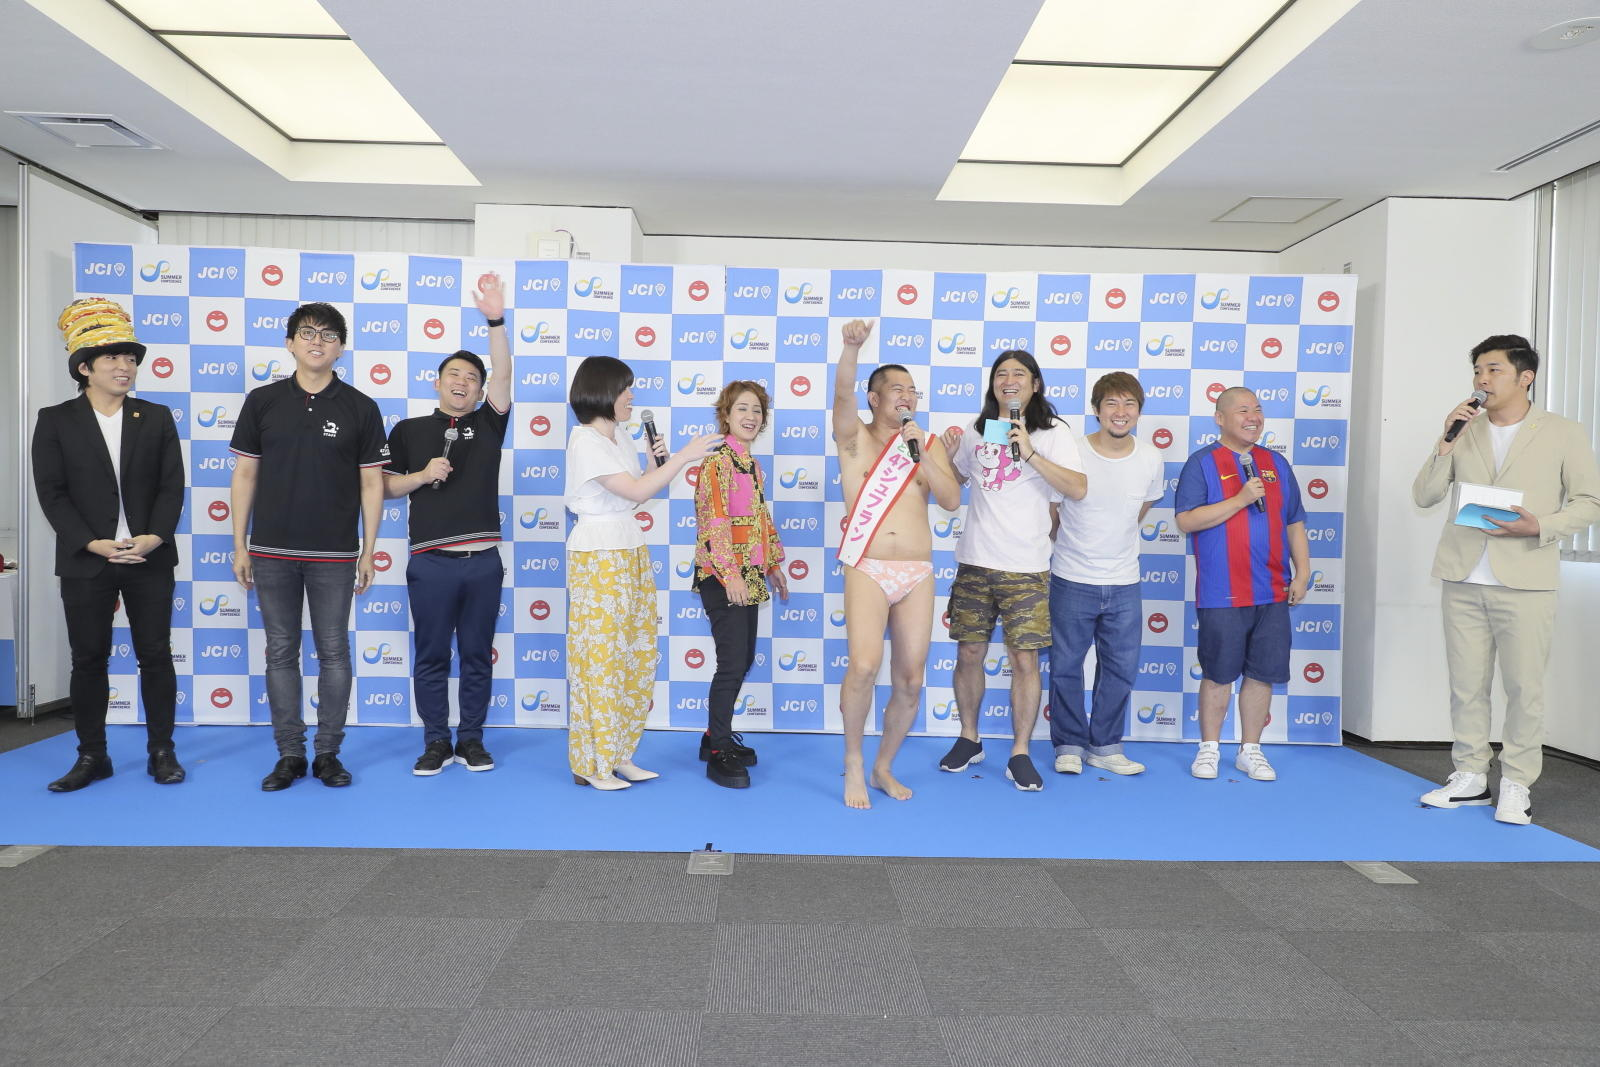 http://news.yoshimoto.co.jp/20170714133440-c994e62c120c60b1586fee67f0a3f56881d606fa.jpg